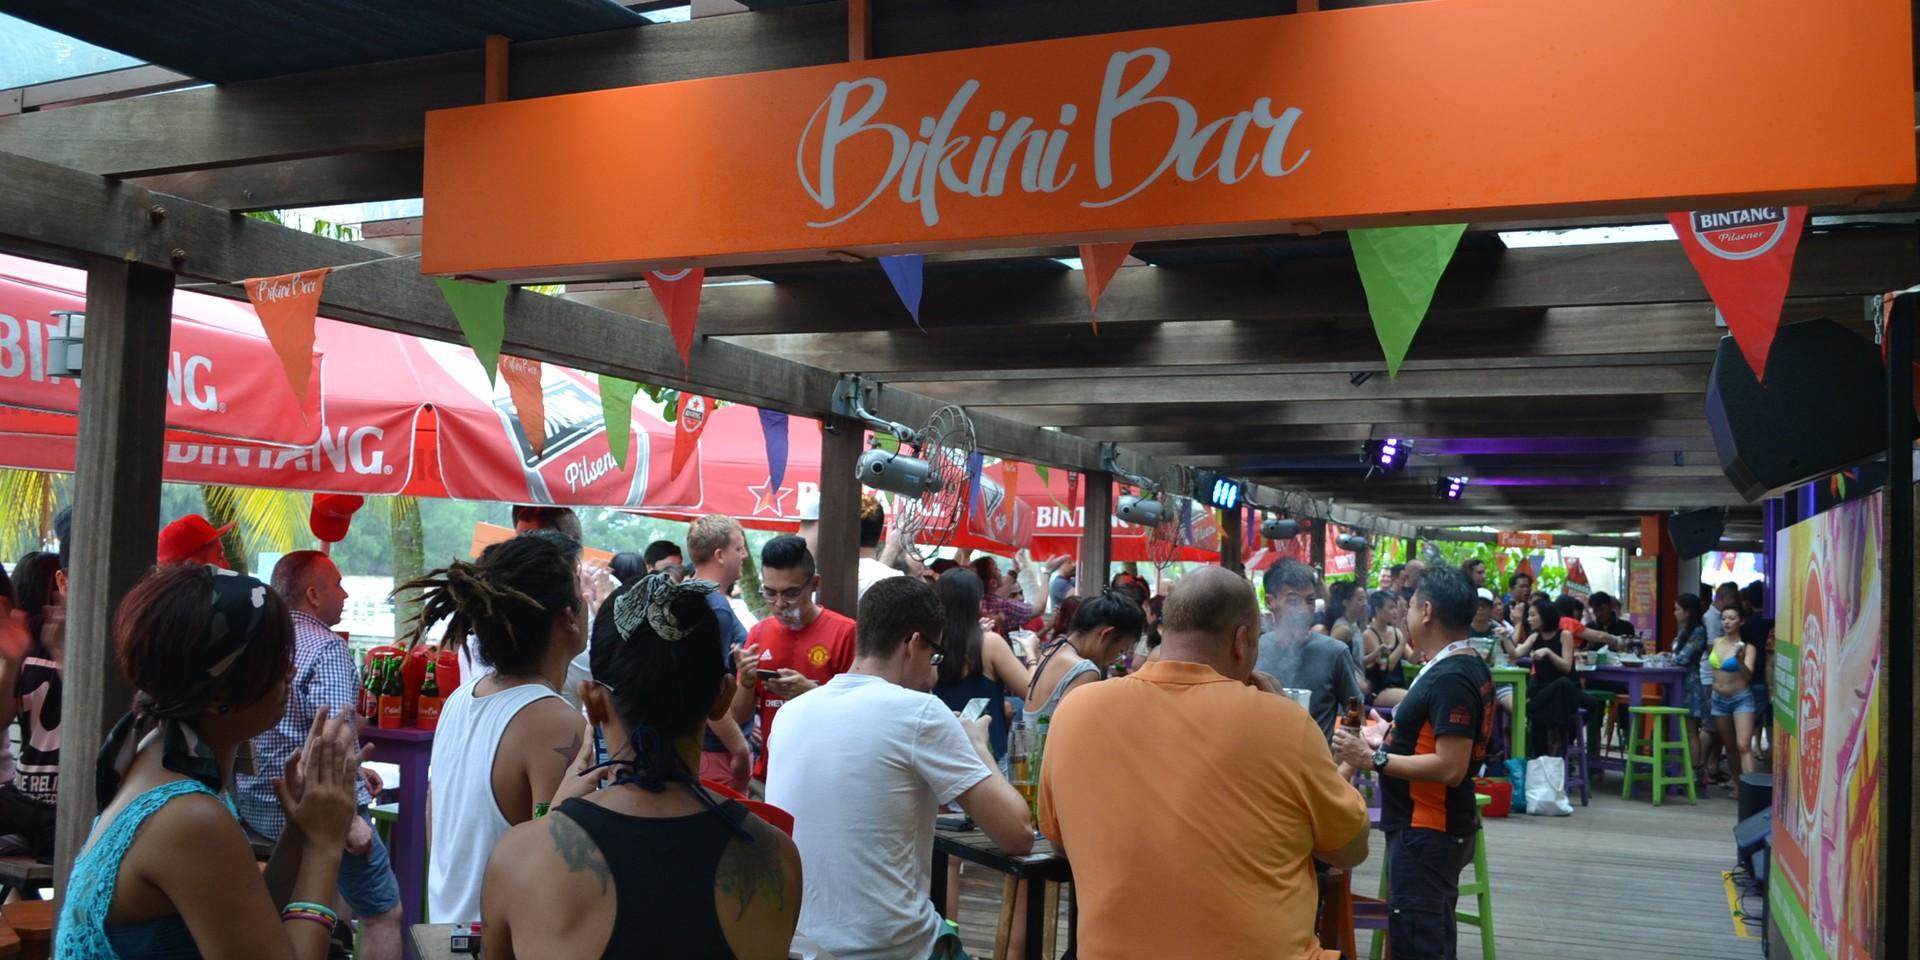 Bikini Bar at Sentosa to kick off live rock performance series Beerkini Rocks with Sweatshop Jam and The Illicit Edition